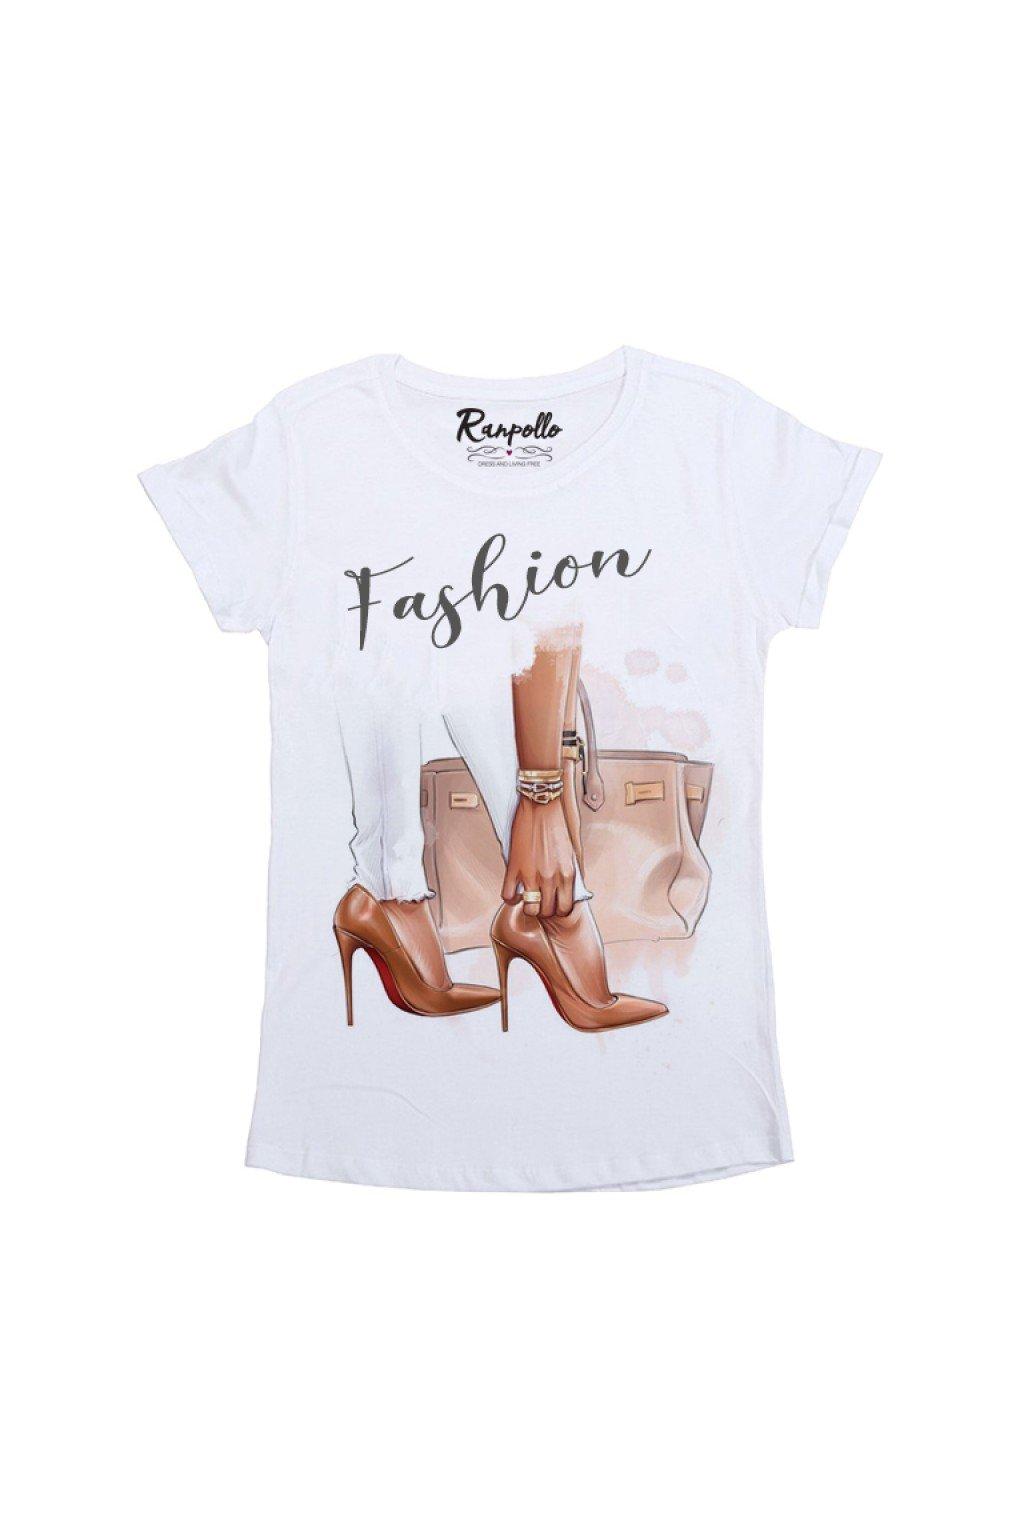 Tričko fashion, Ranpollo - bílé (Velikost Velikost L)